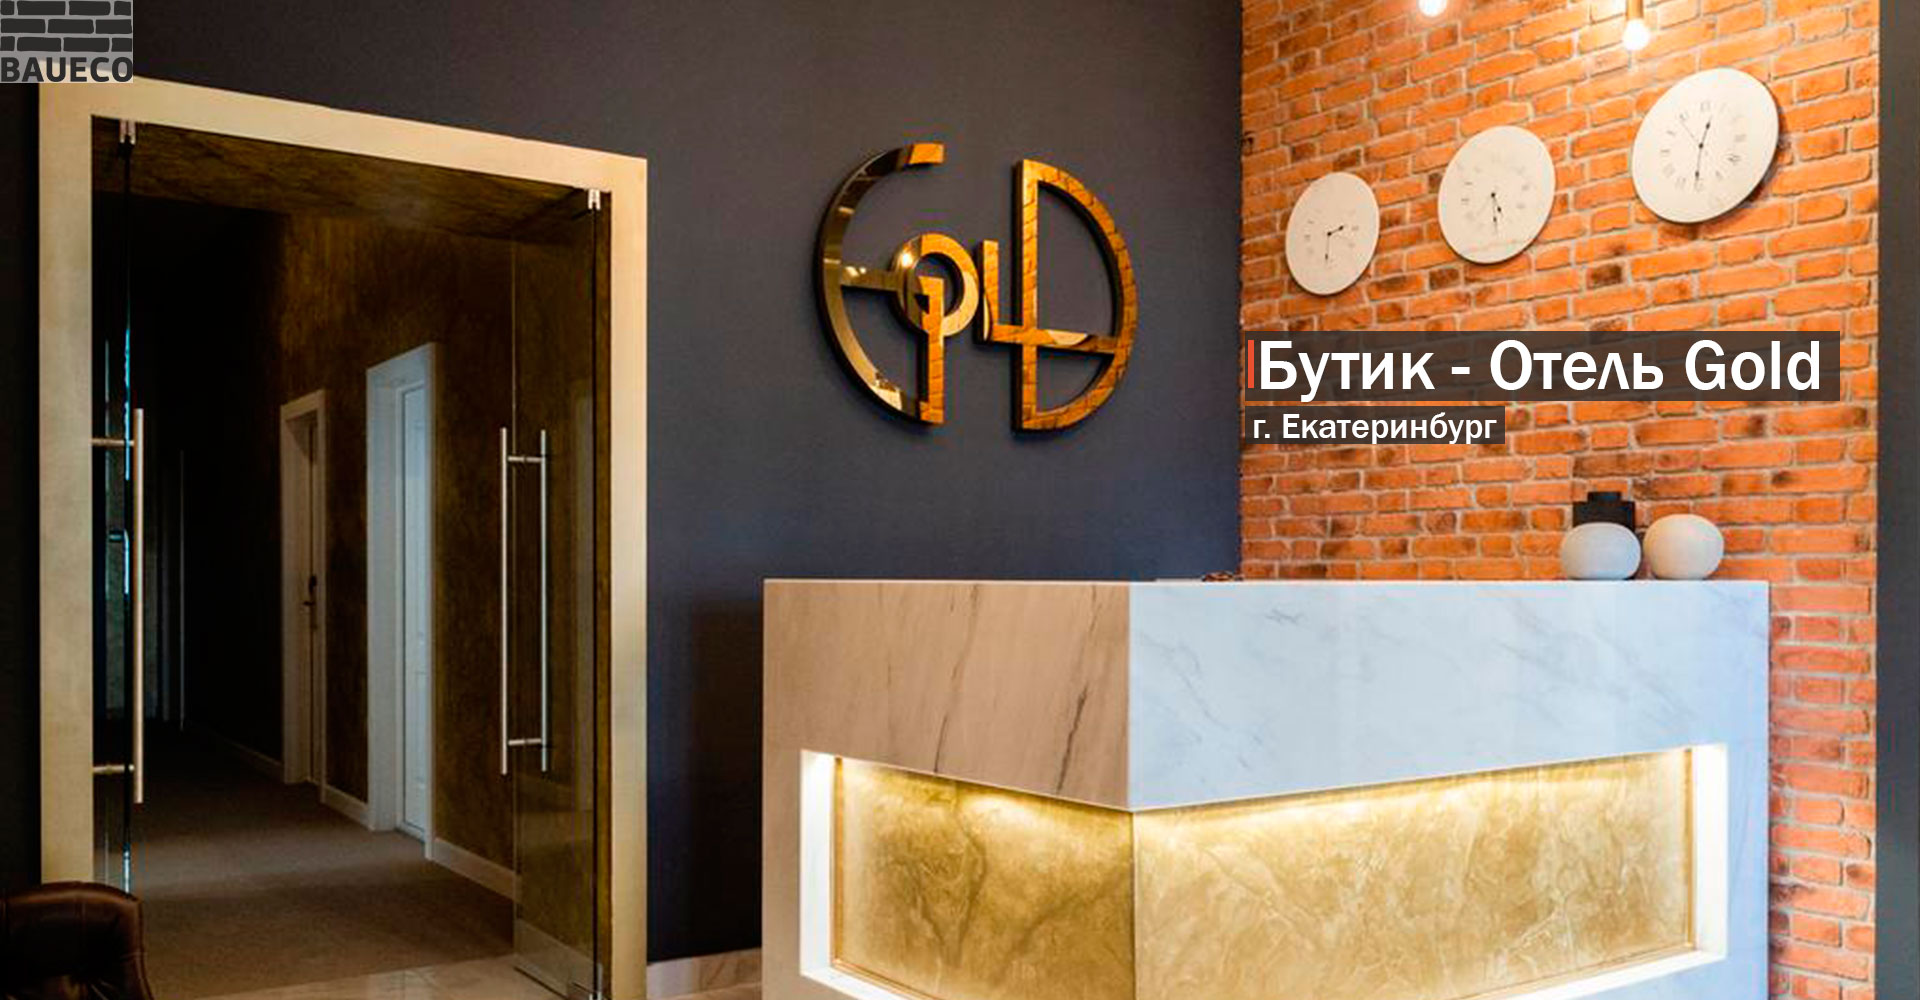 Отель бутик Gold плитка под кирпич БауЭко